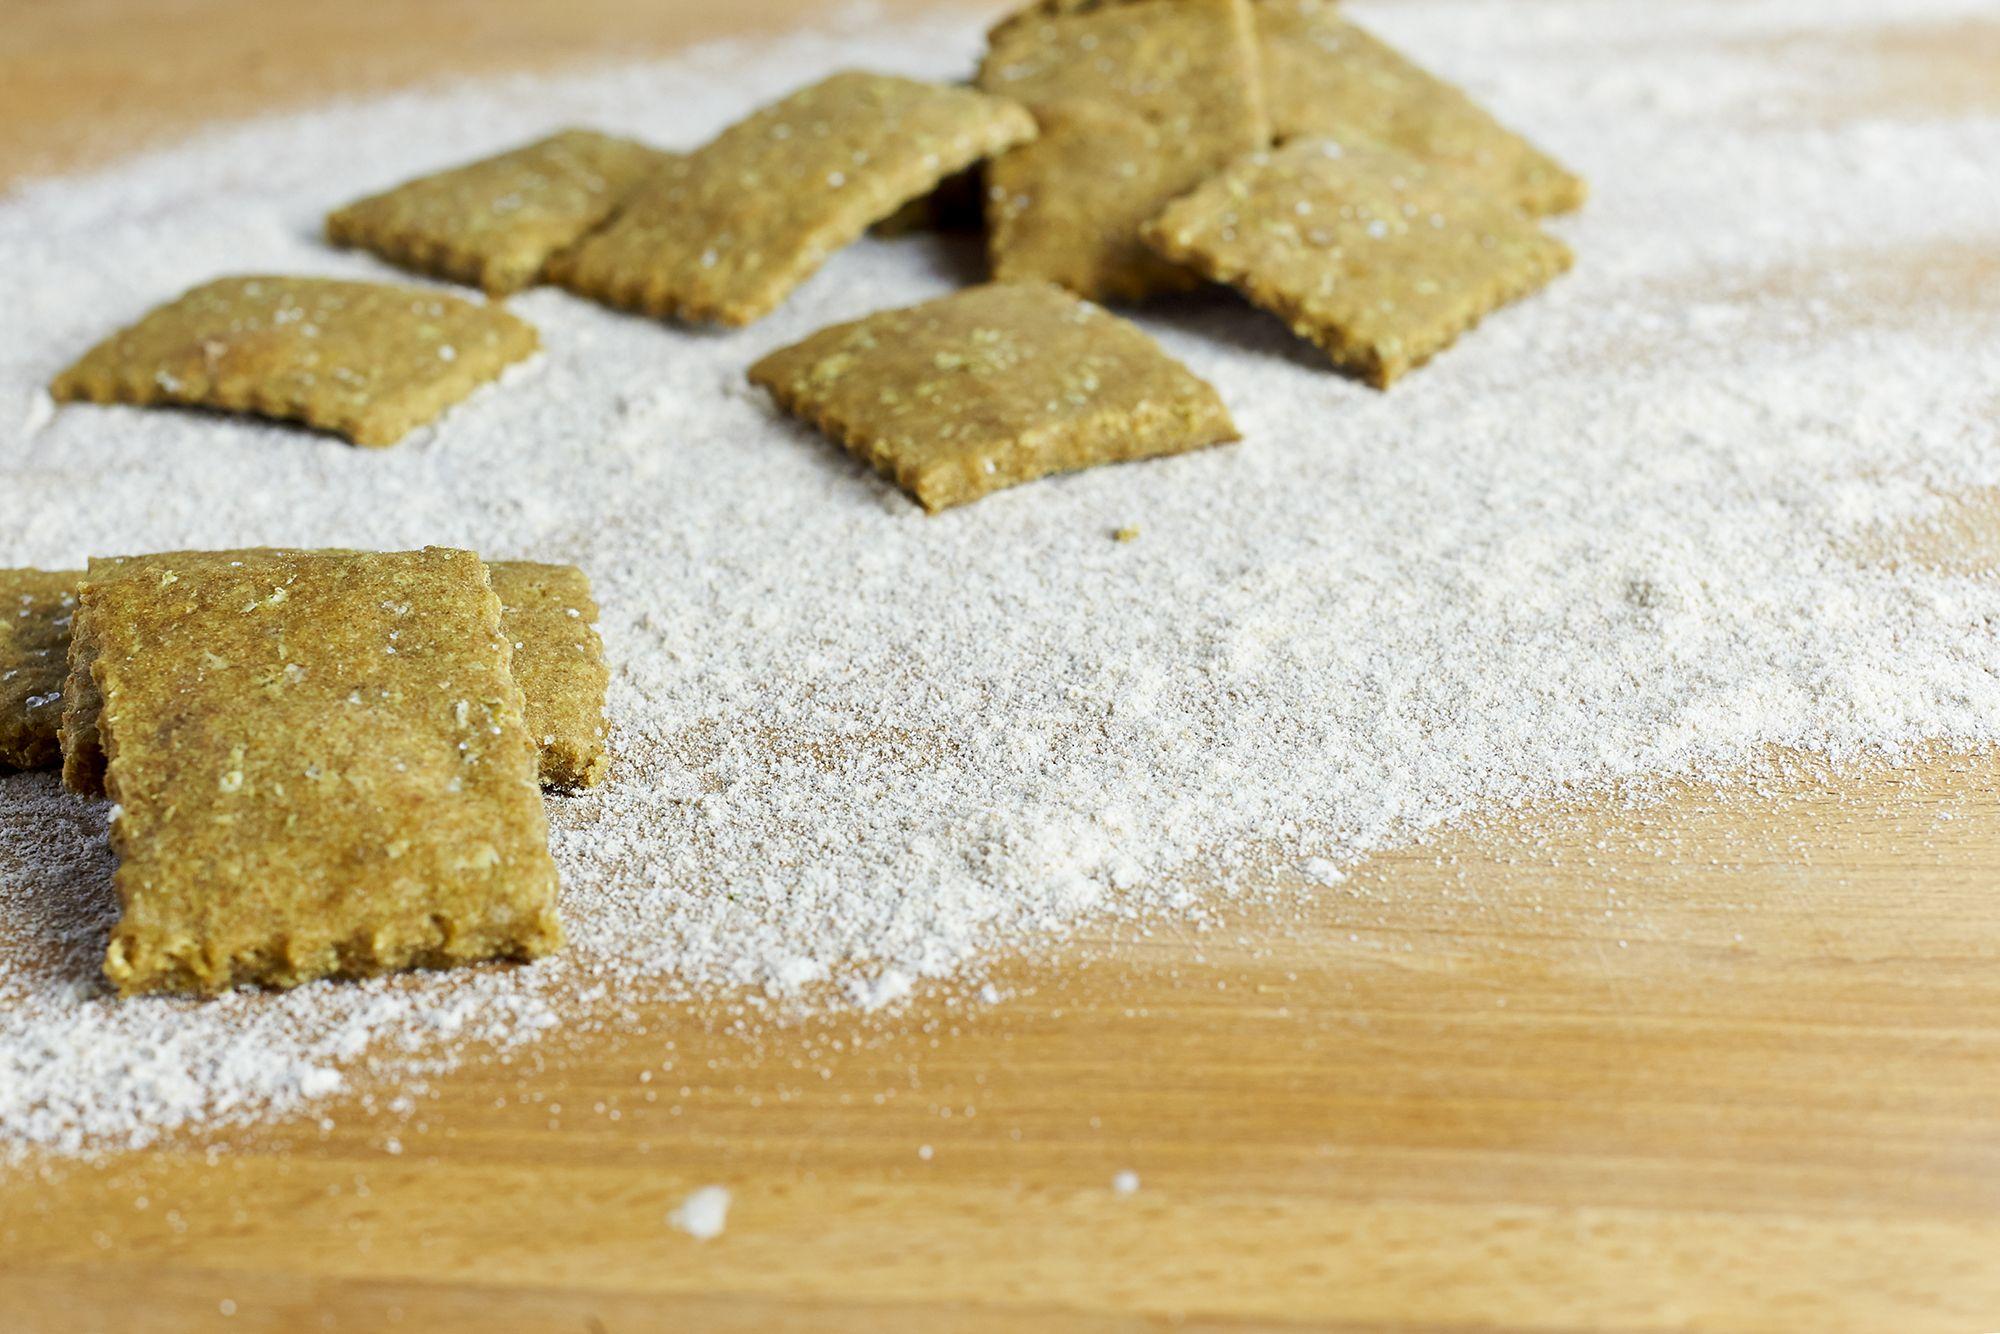 BIGODINO - biscotti piselli e zenzero 3 copia